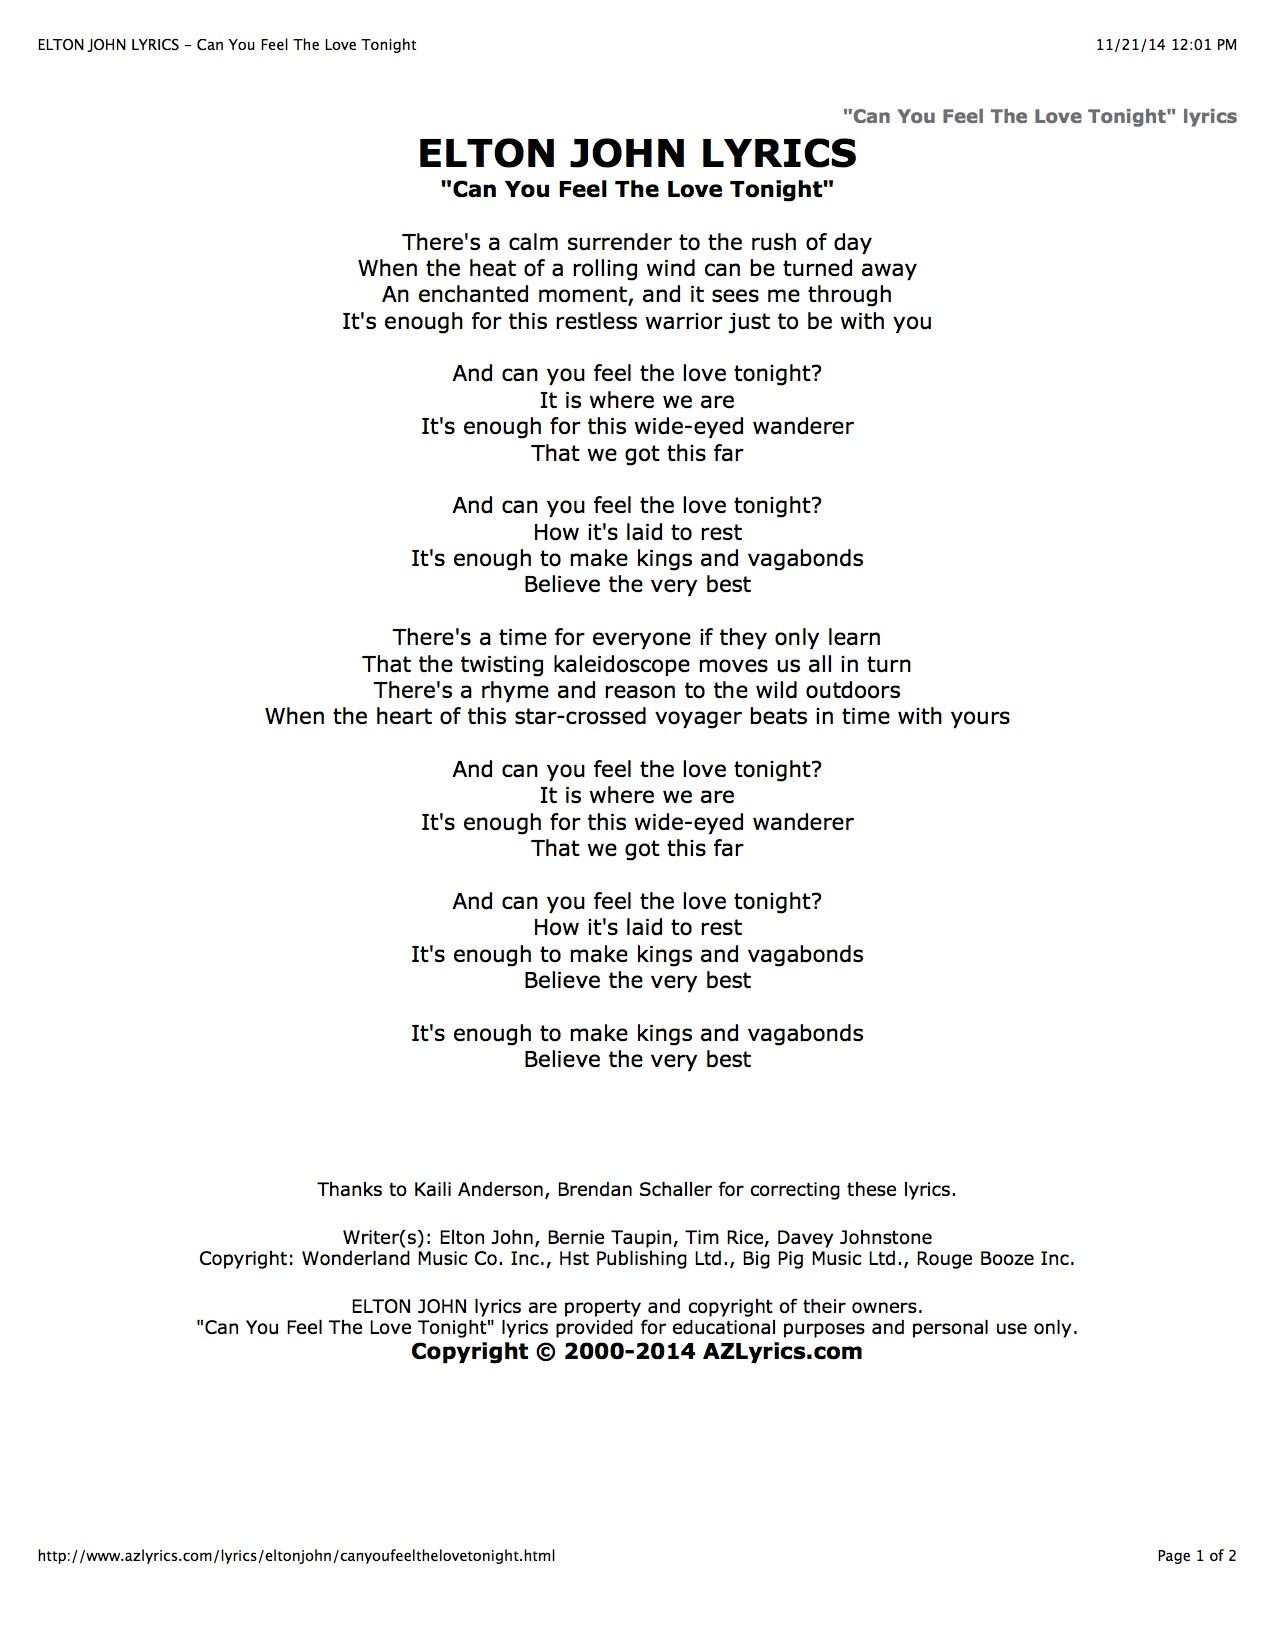 Can u feel love tonight lyrics